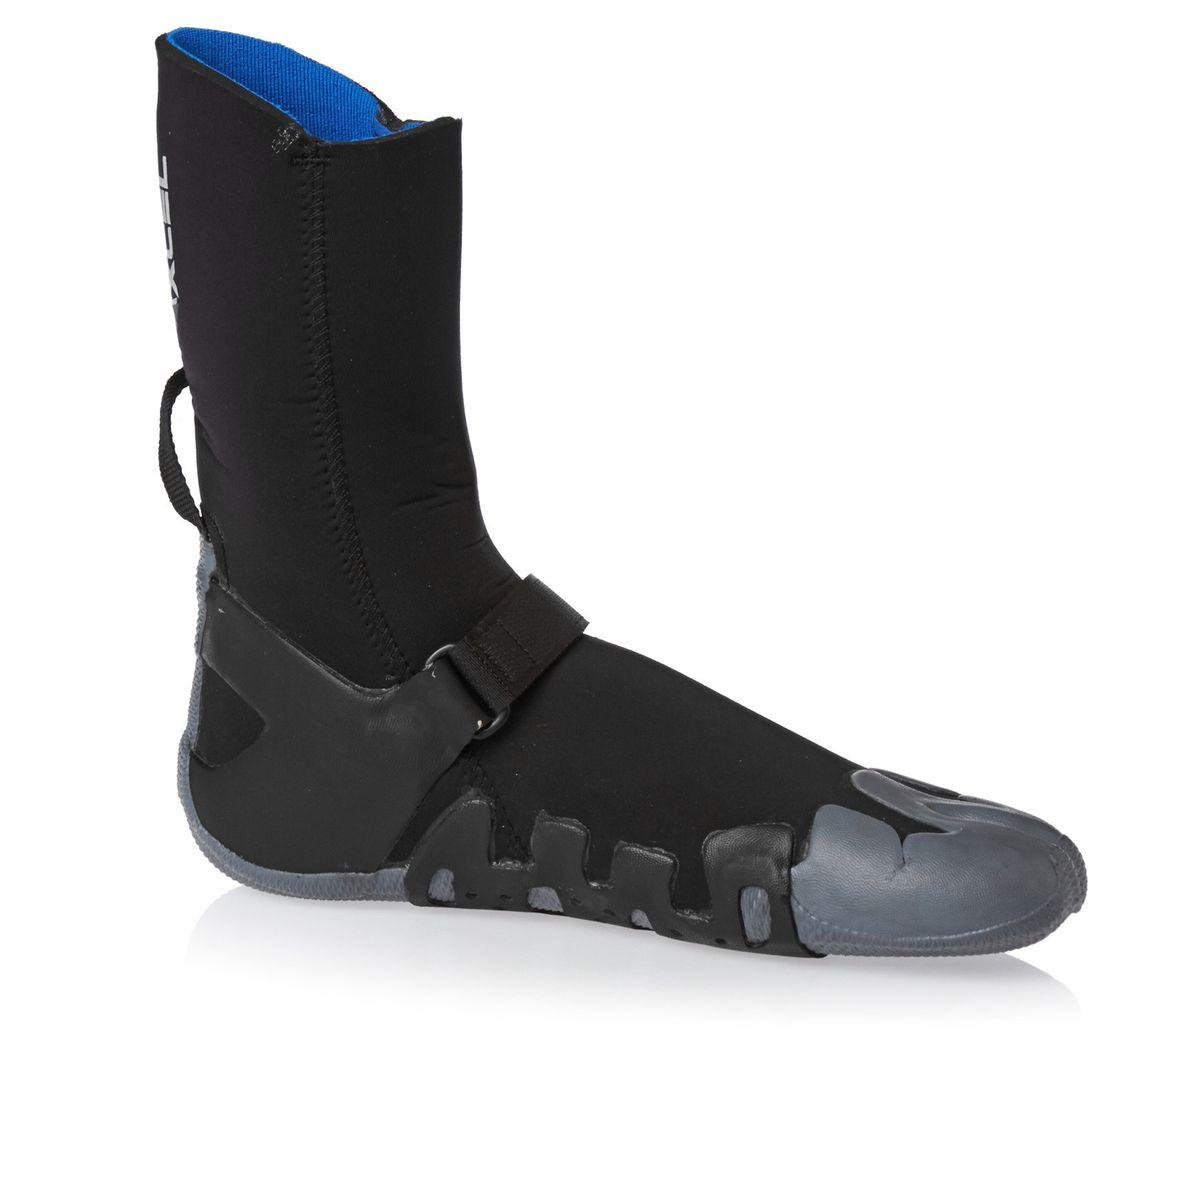 Xcel Infiniti 5mm Split Toe Wetsuit Boots - Black